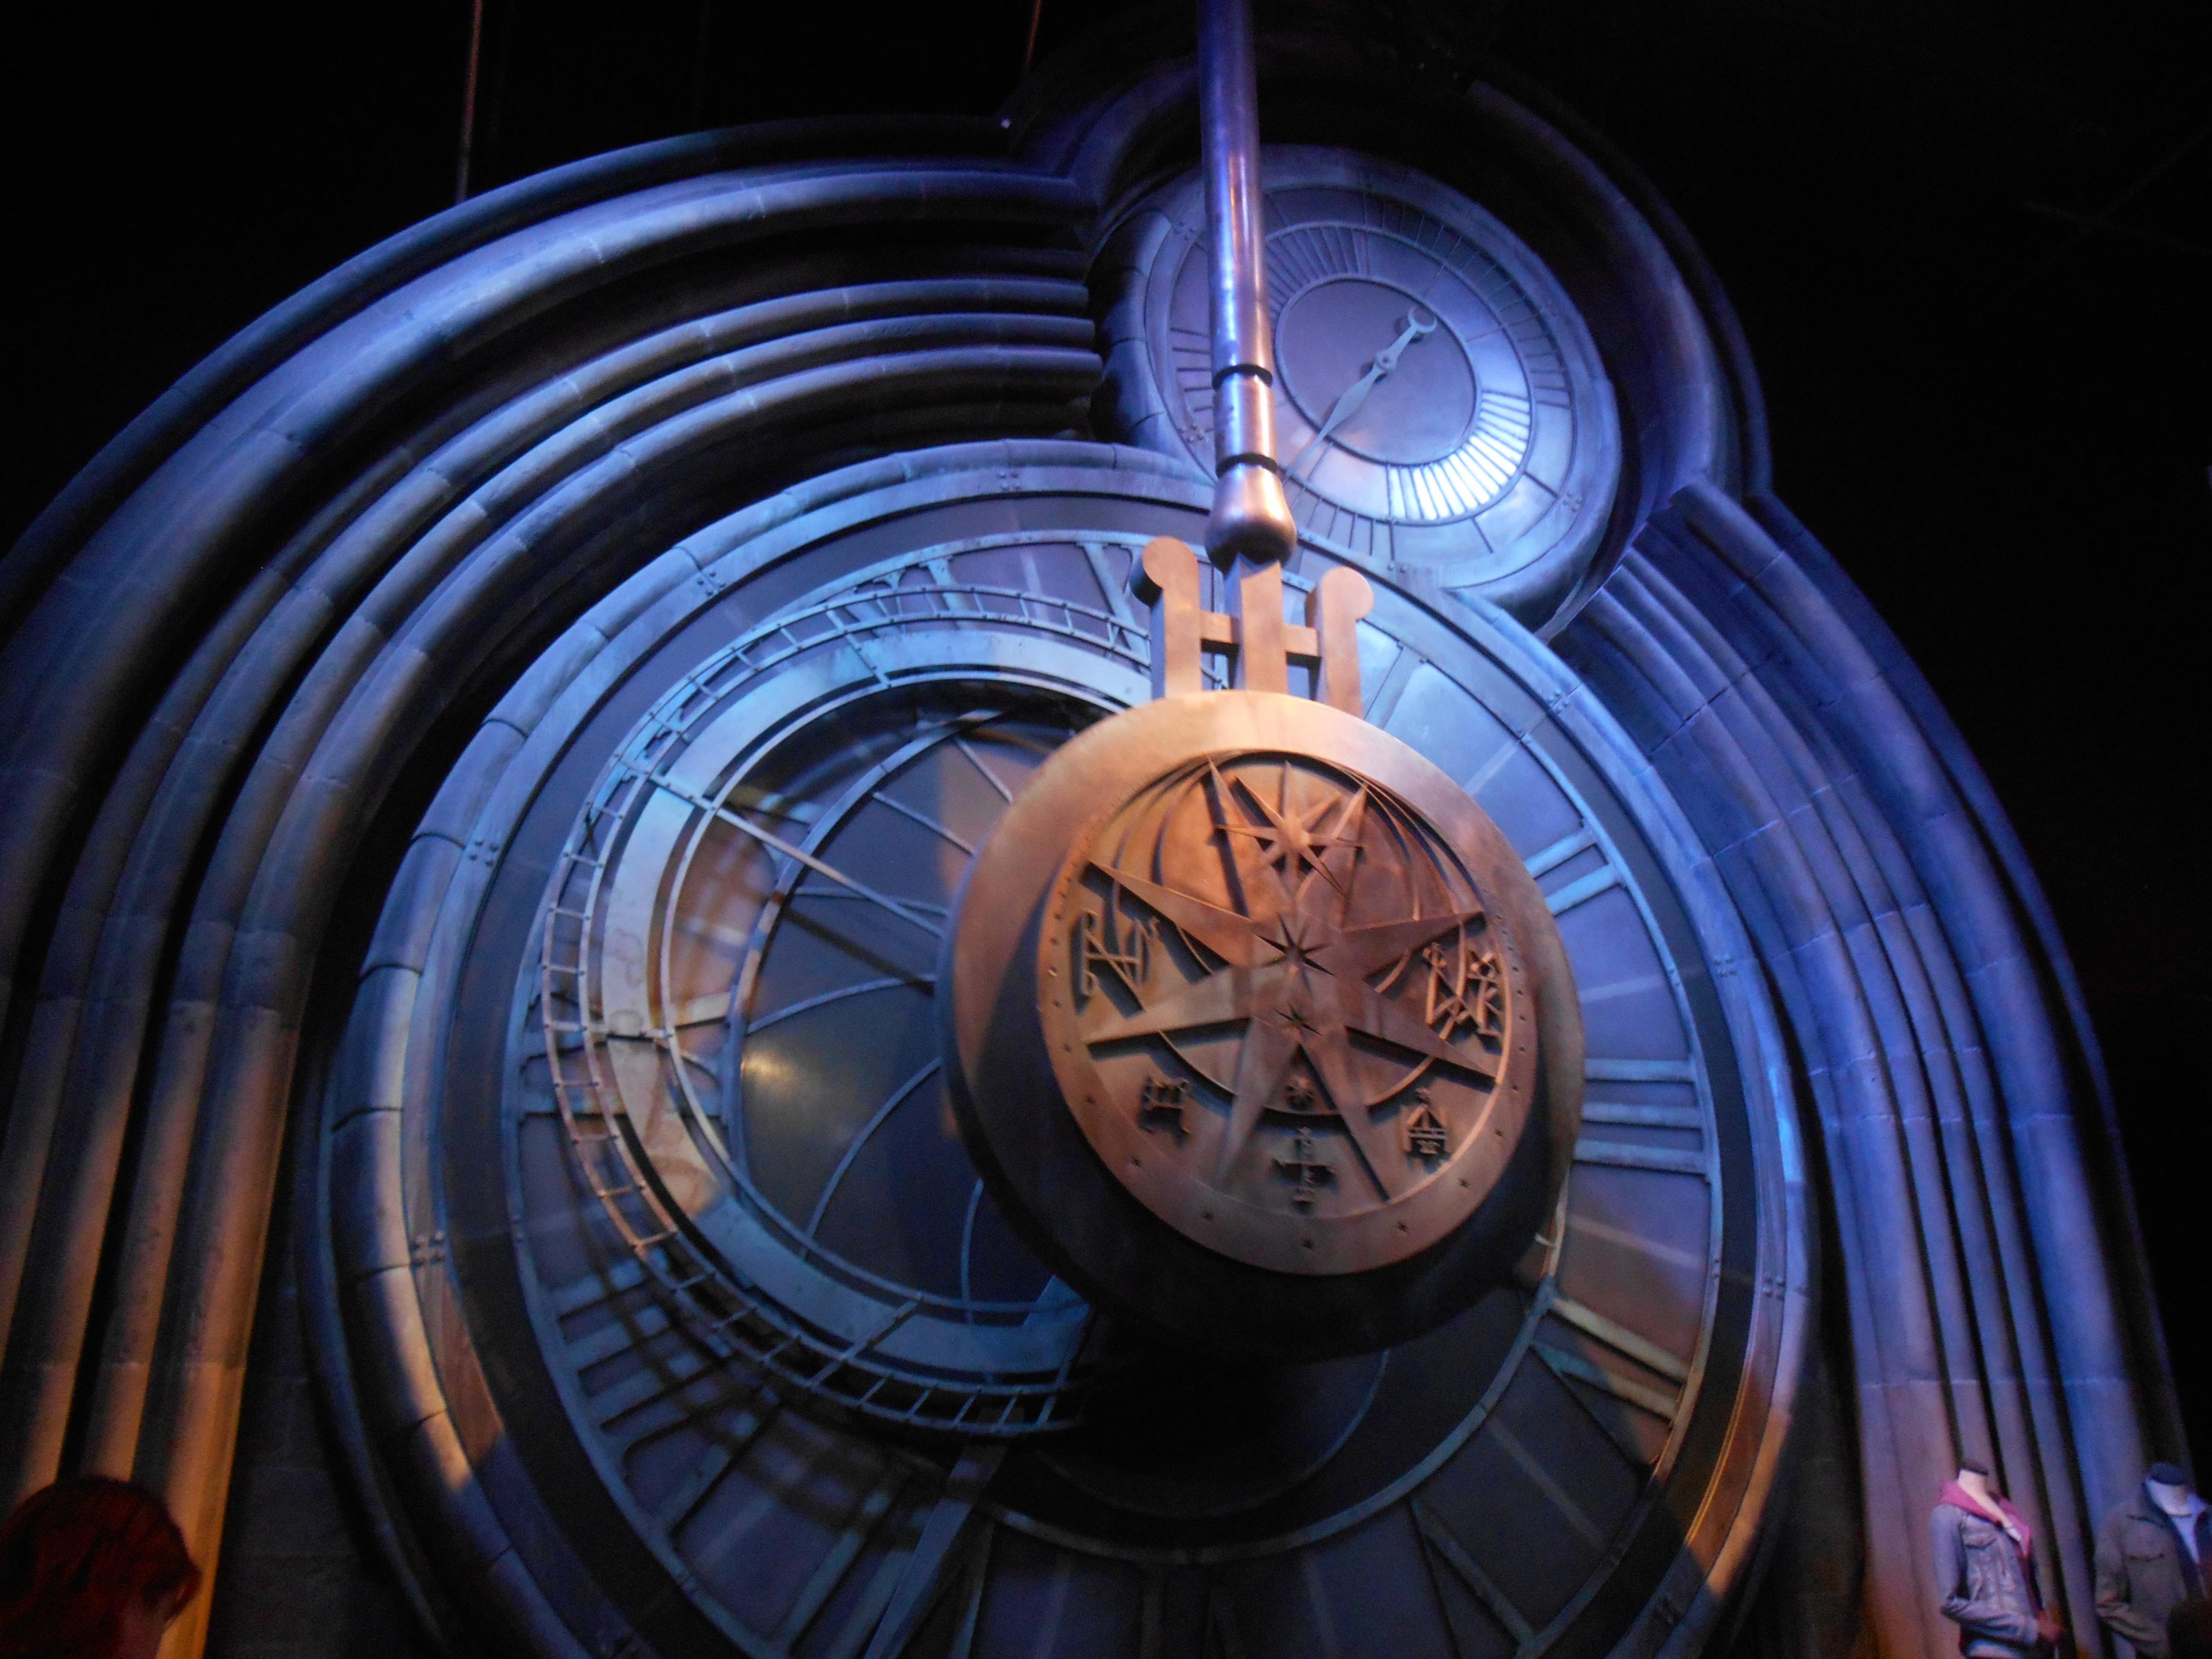 hogwart-clock.jpg